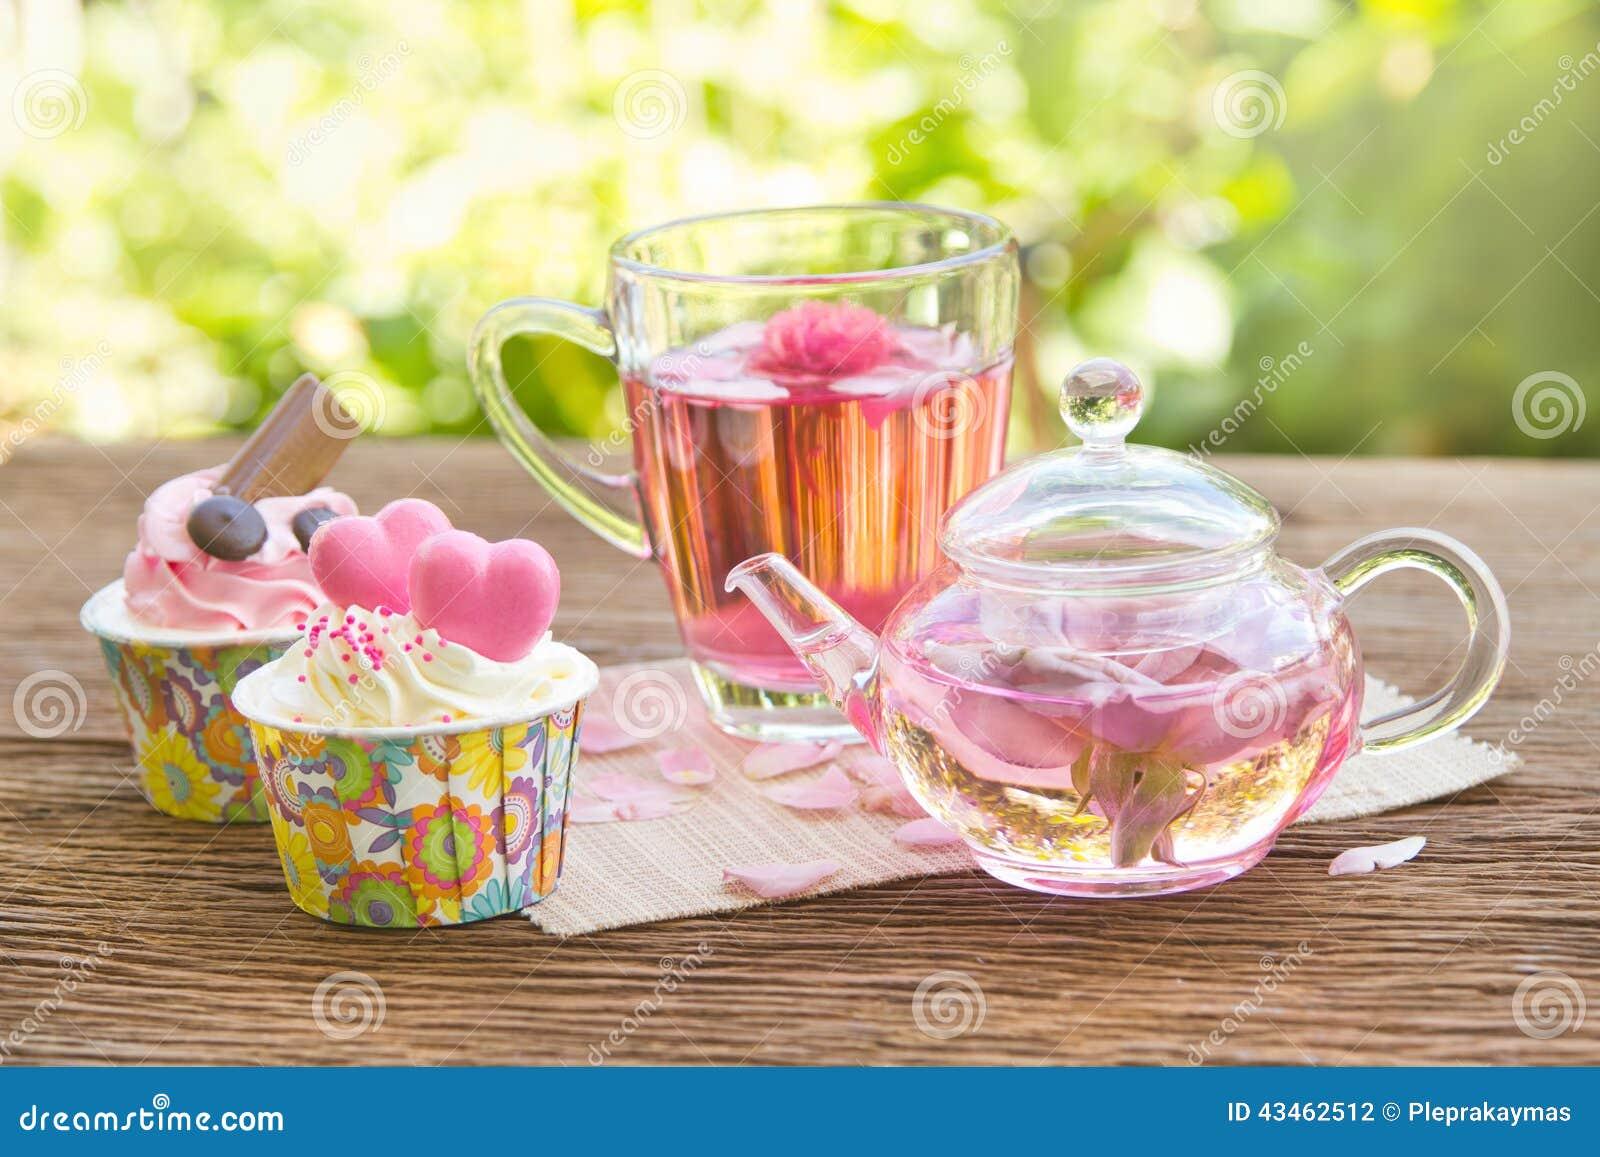 rose tea with tea pot in the garden stock photo image 43462512. Black Bedroom Furniture Sets. Home Design Ideas